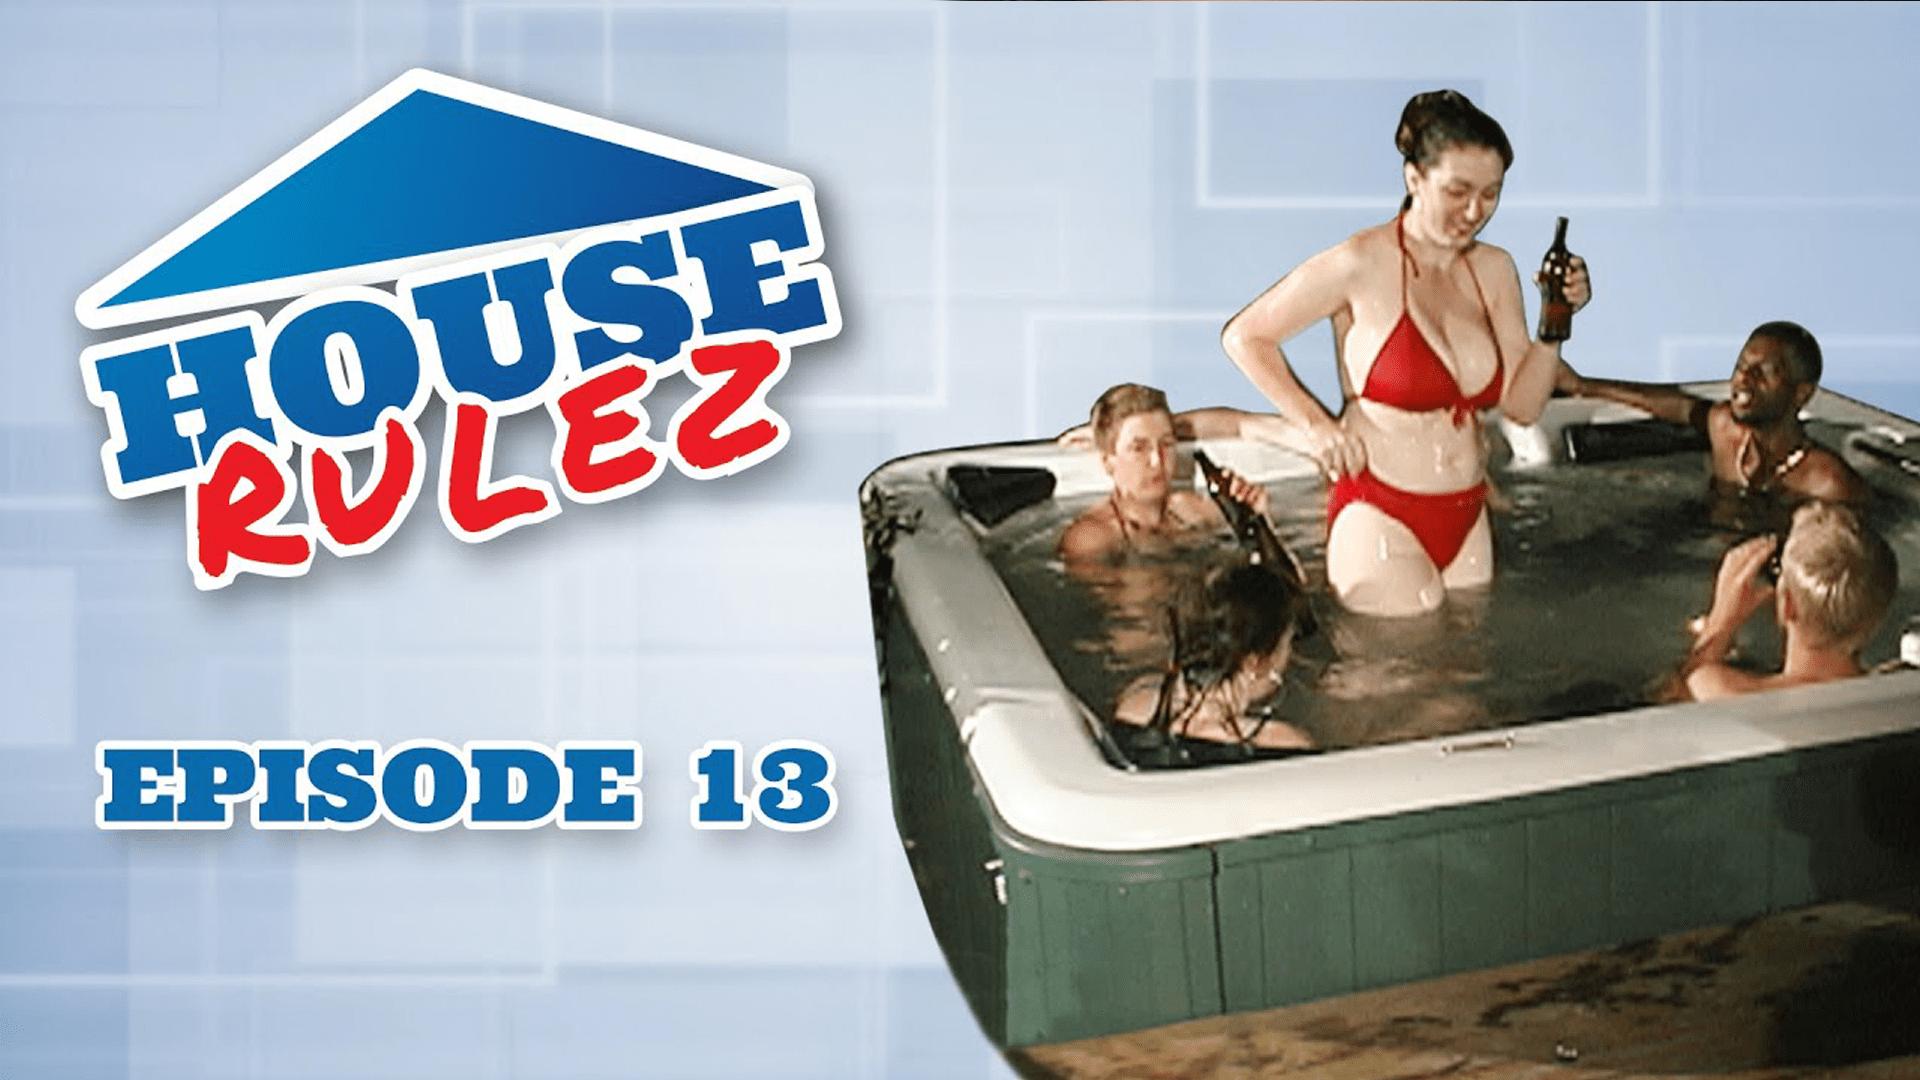 House Rulez Episode 13